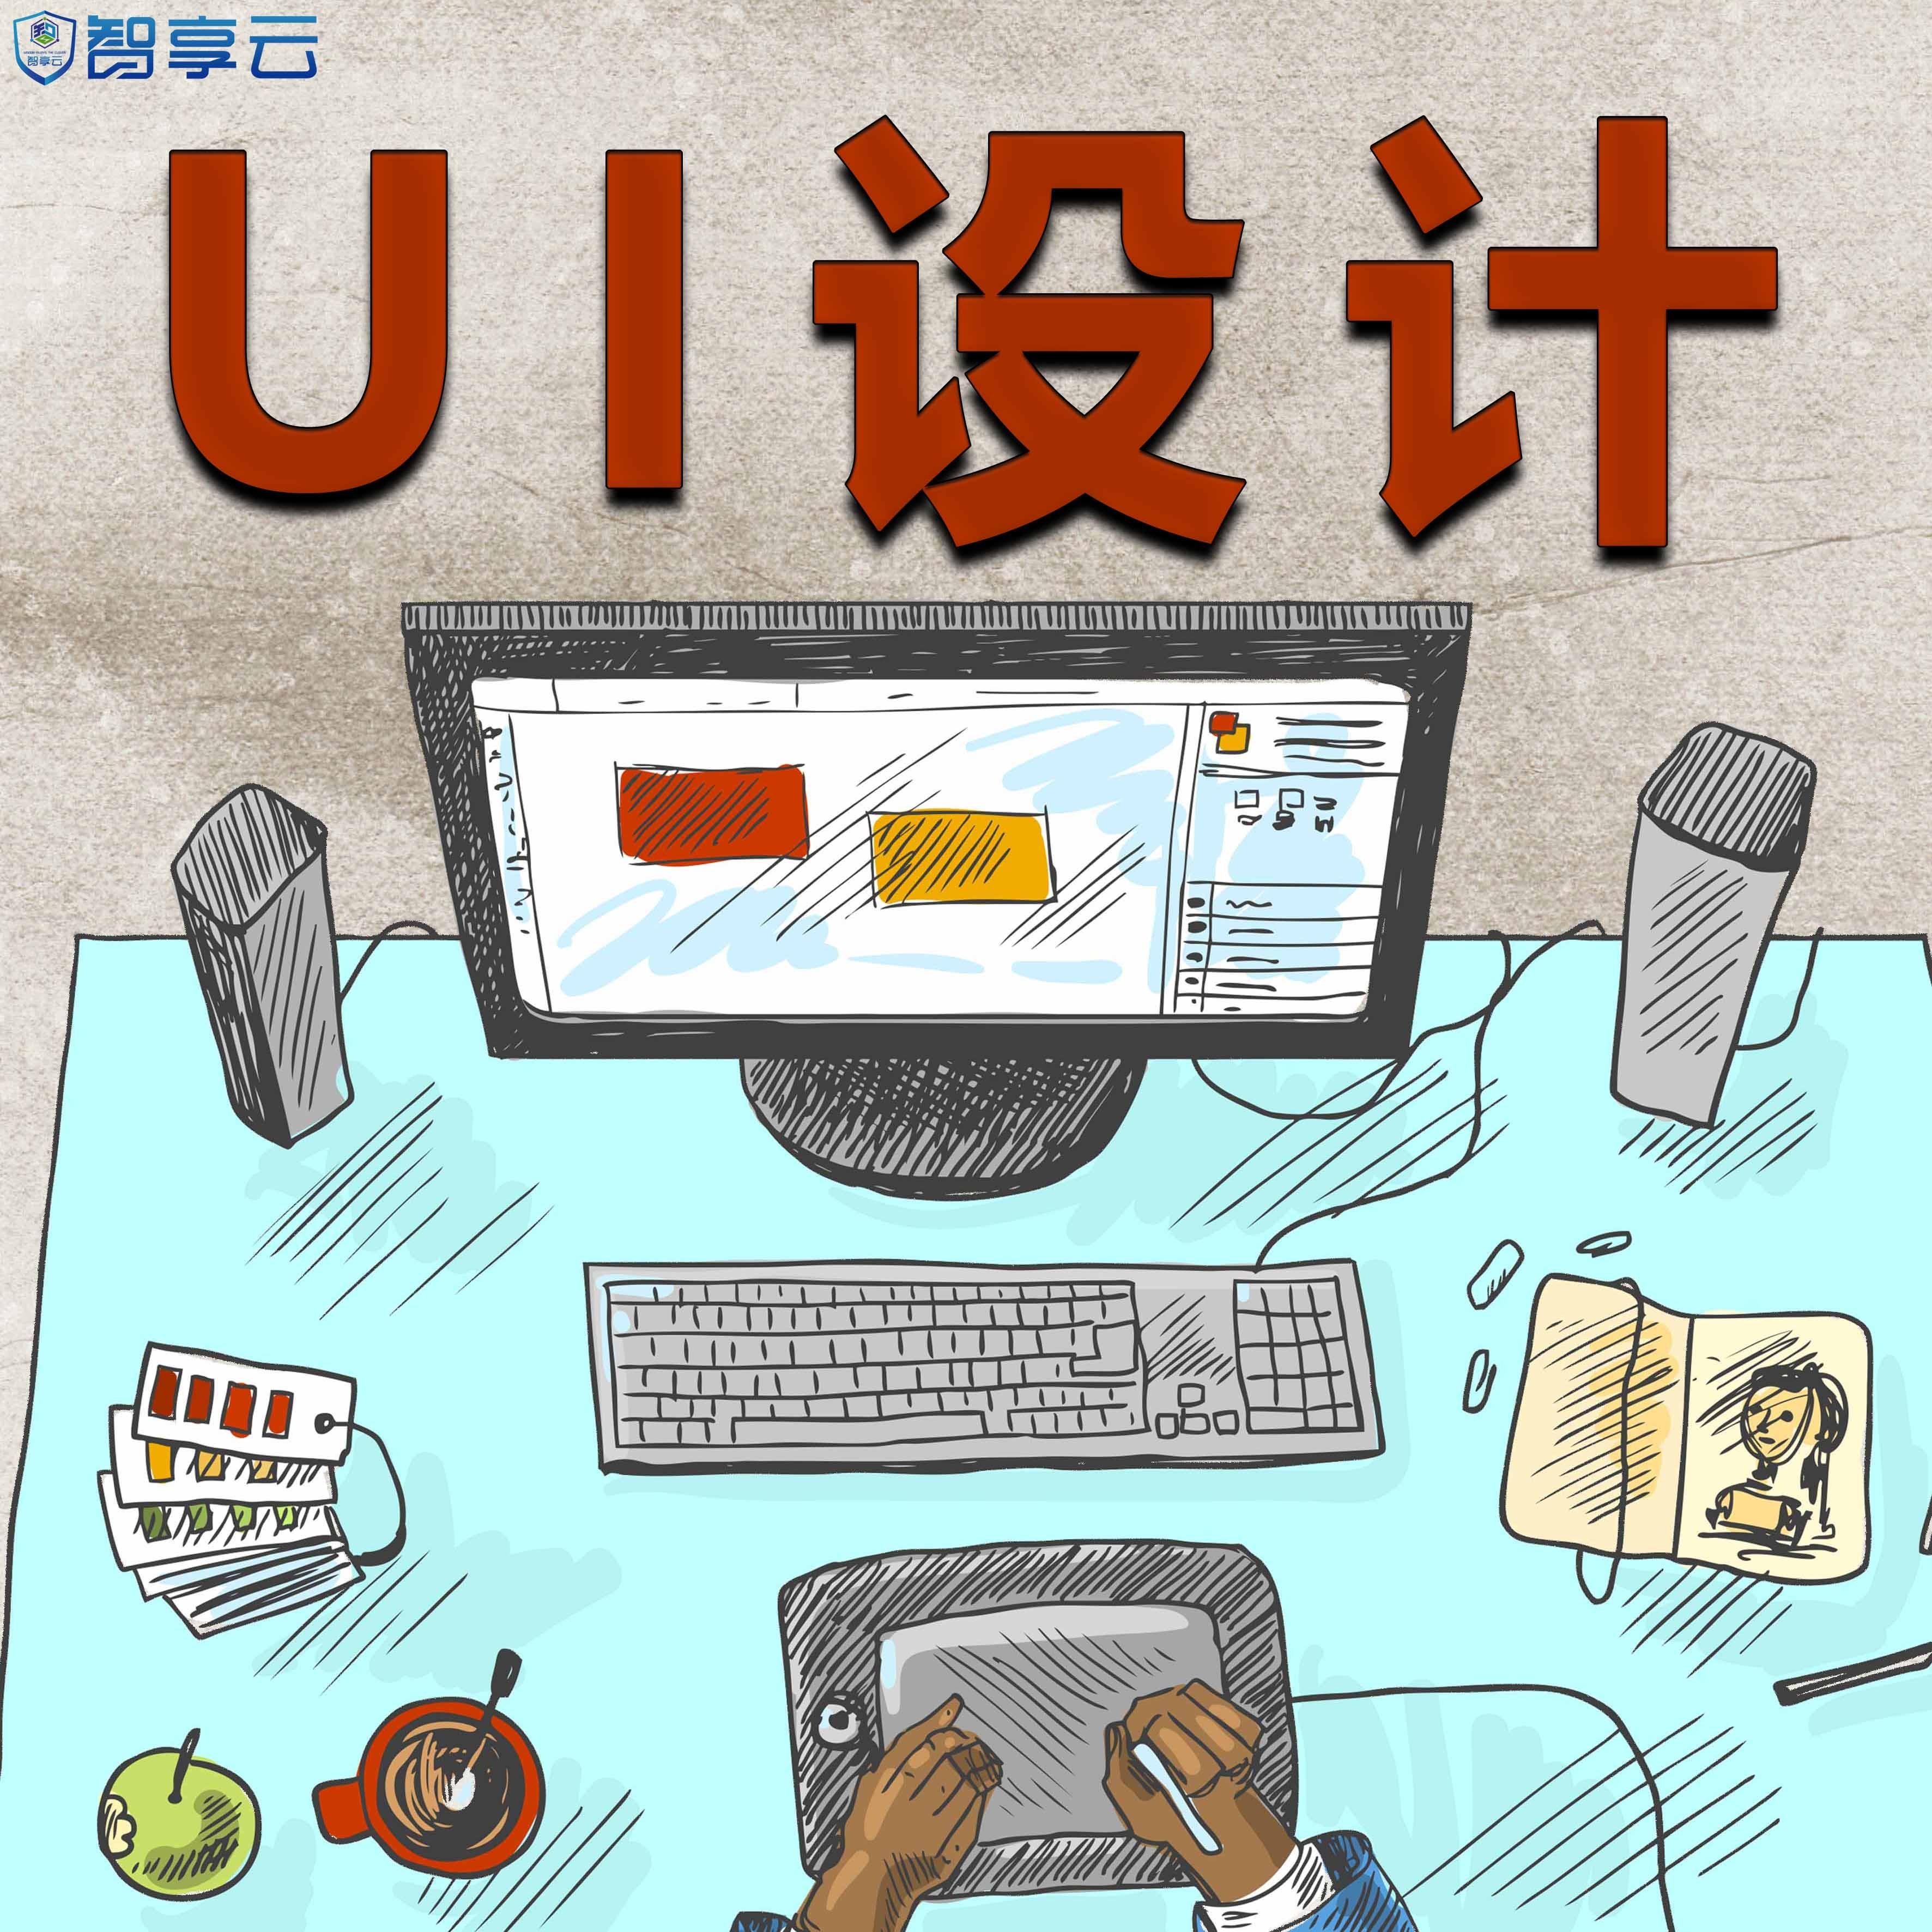 UI设计小程序手机游戏软件客户端网页APP界面H5交互设计图